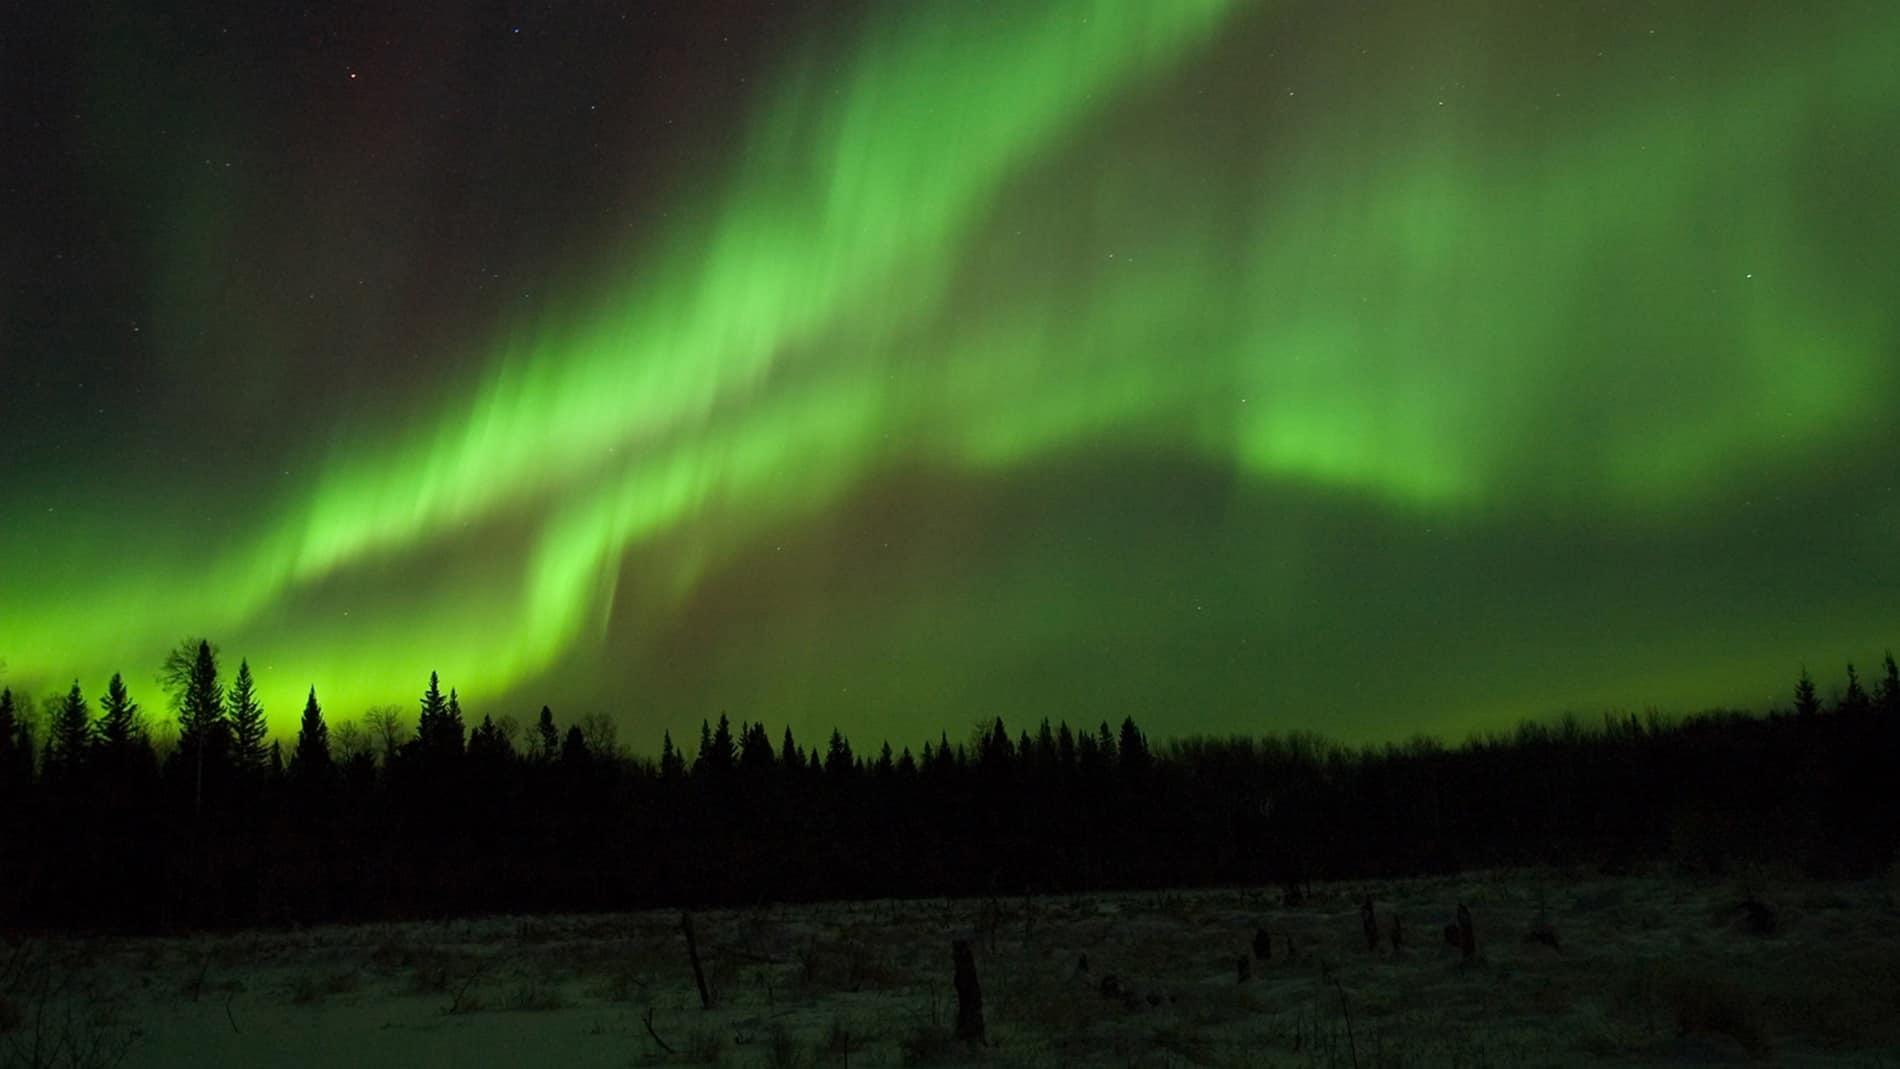 Photograph of Saskatchewan's living sky